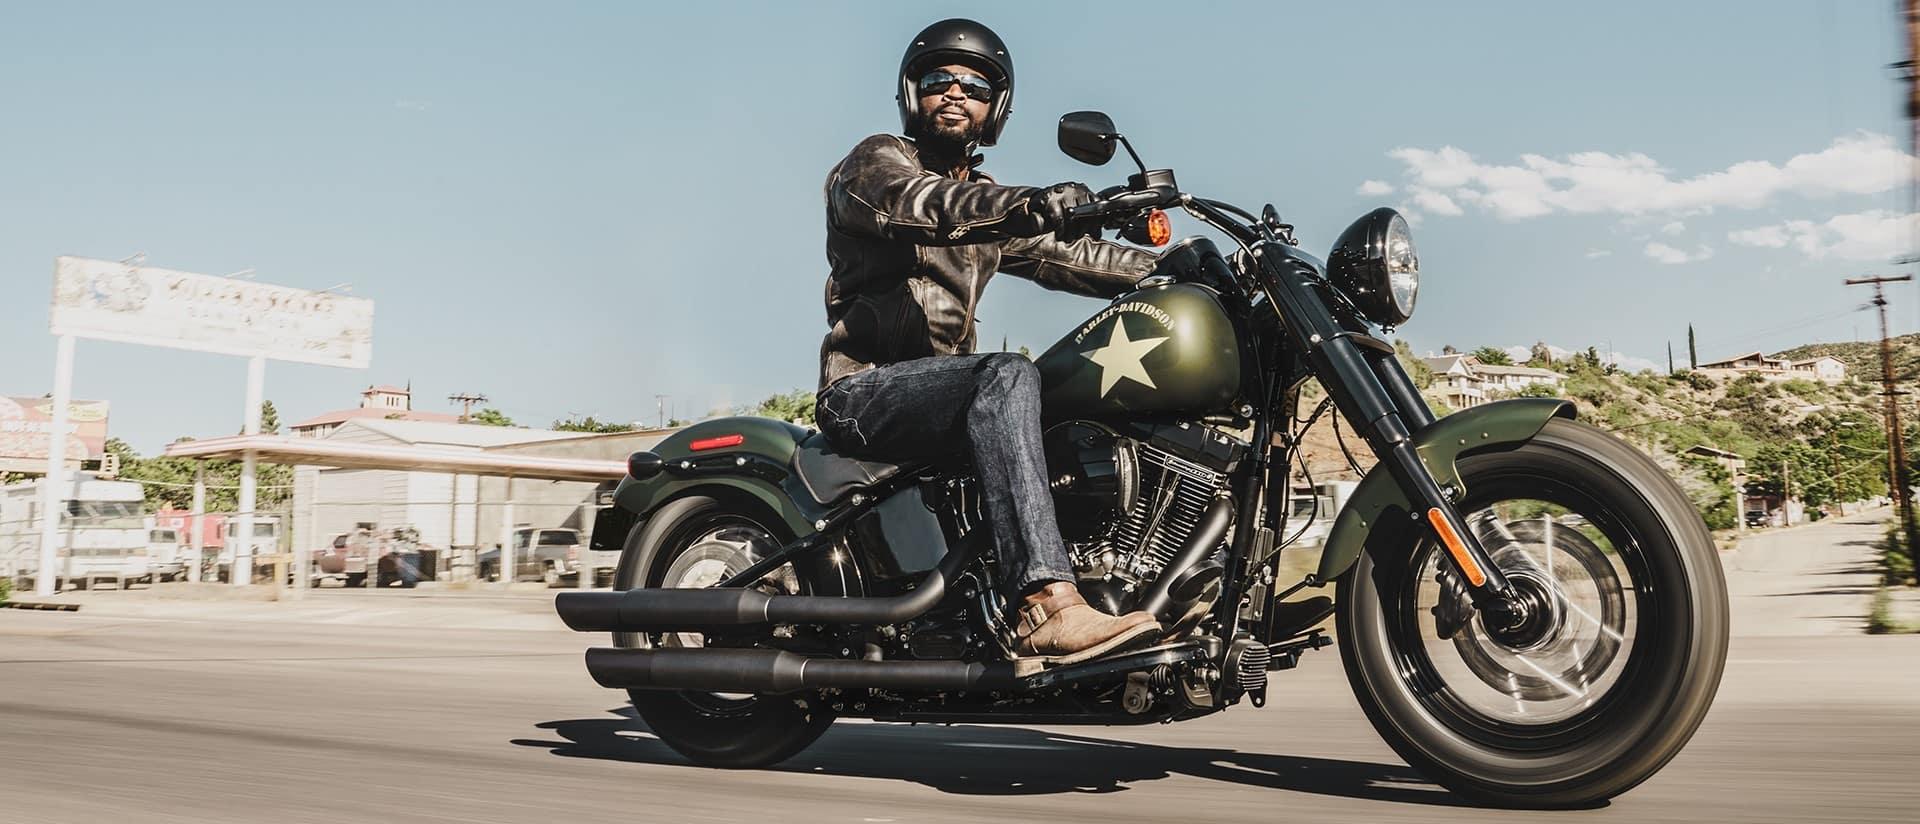 Climate Control Wiley-X Harley-Davidson Motorcycle Eyewear